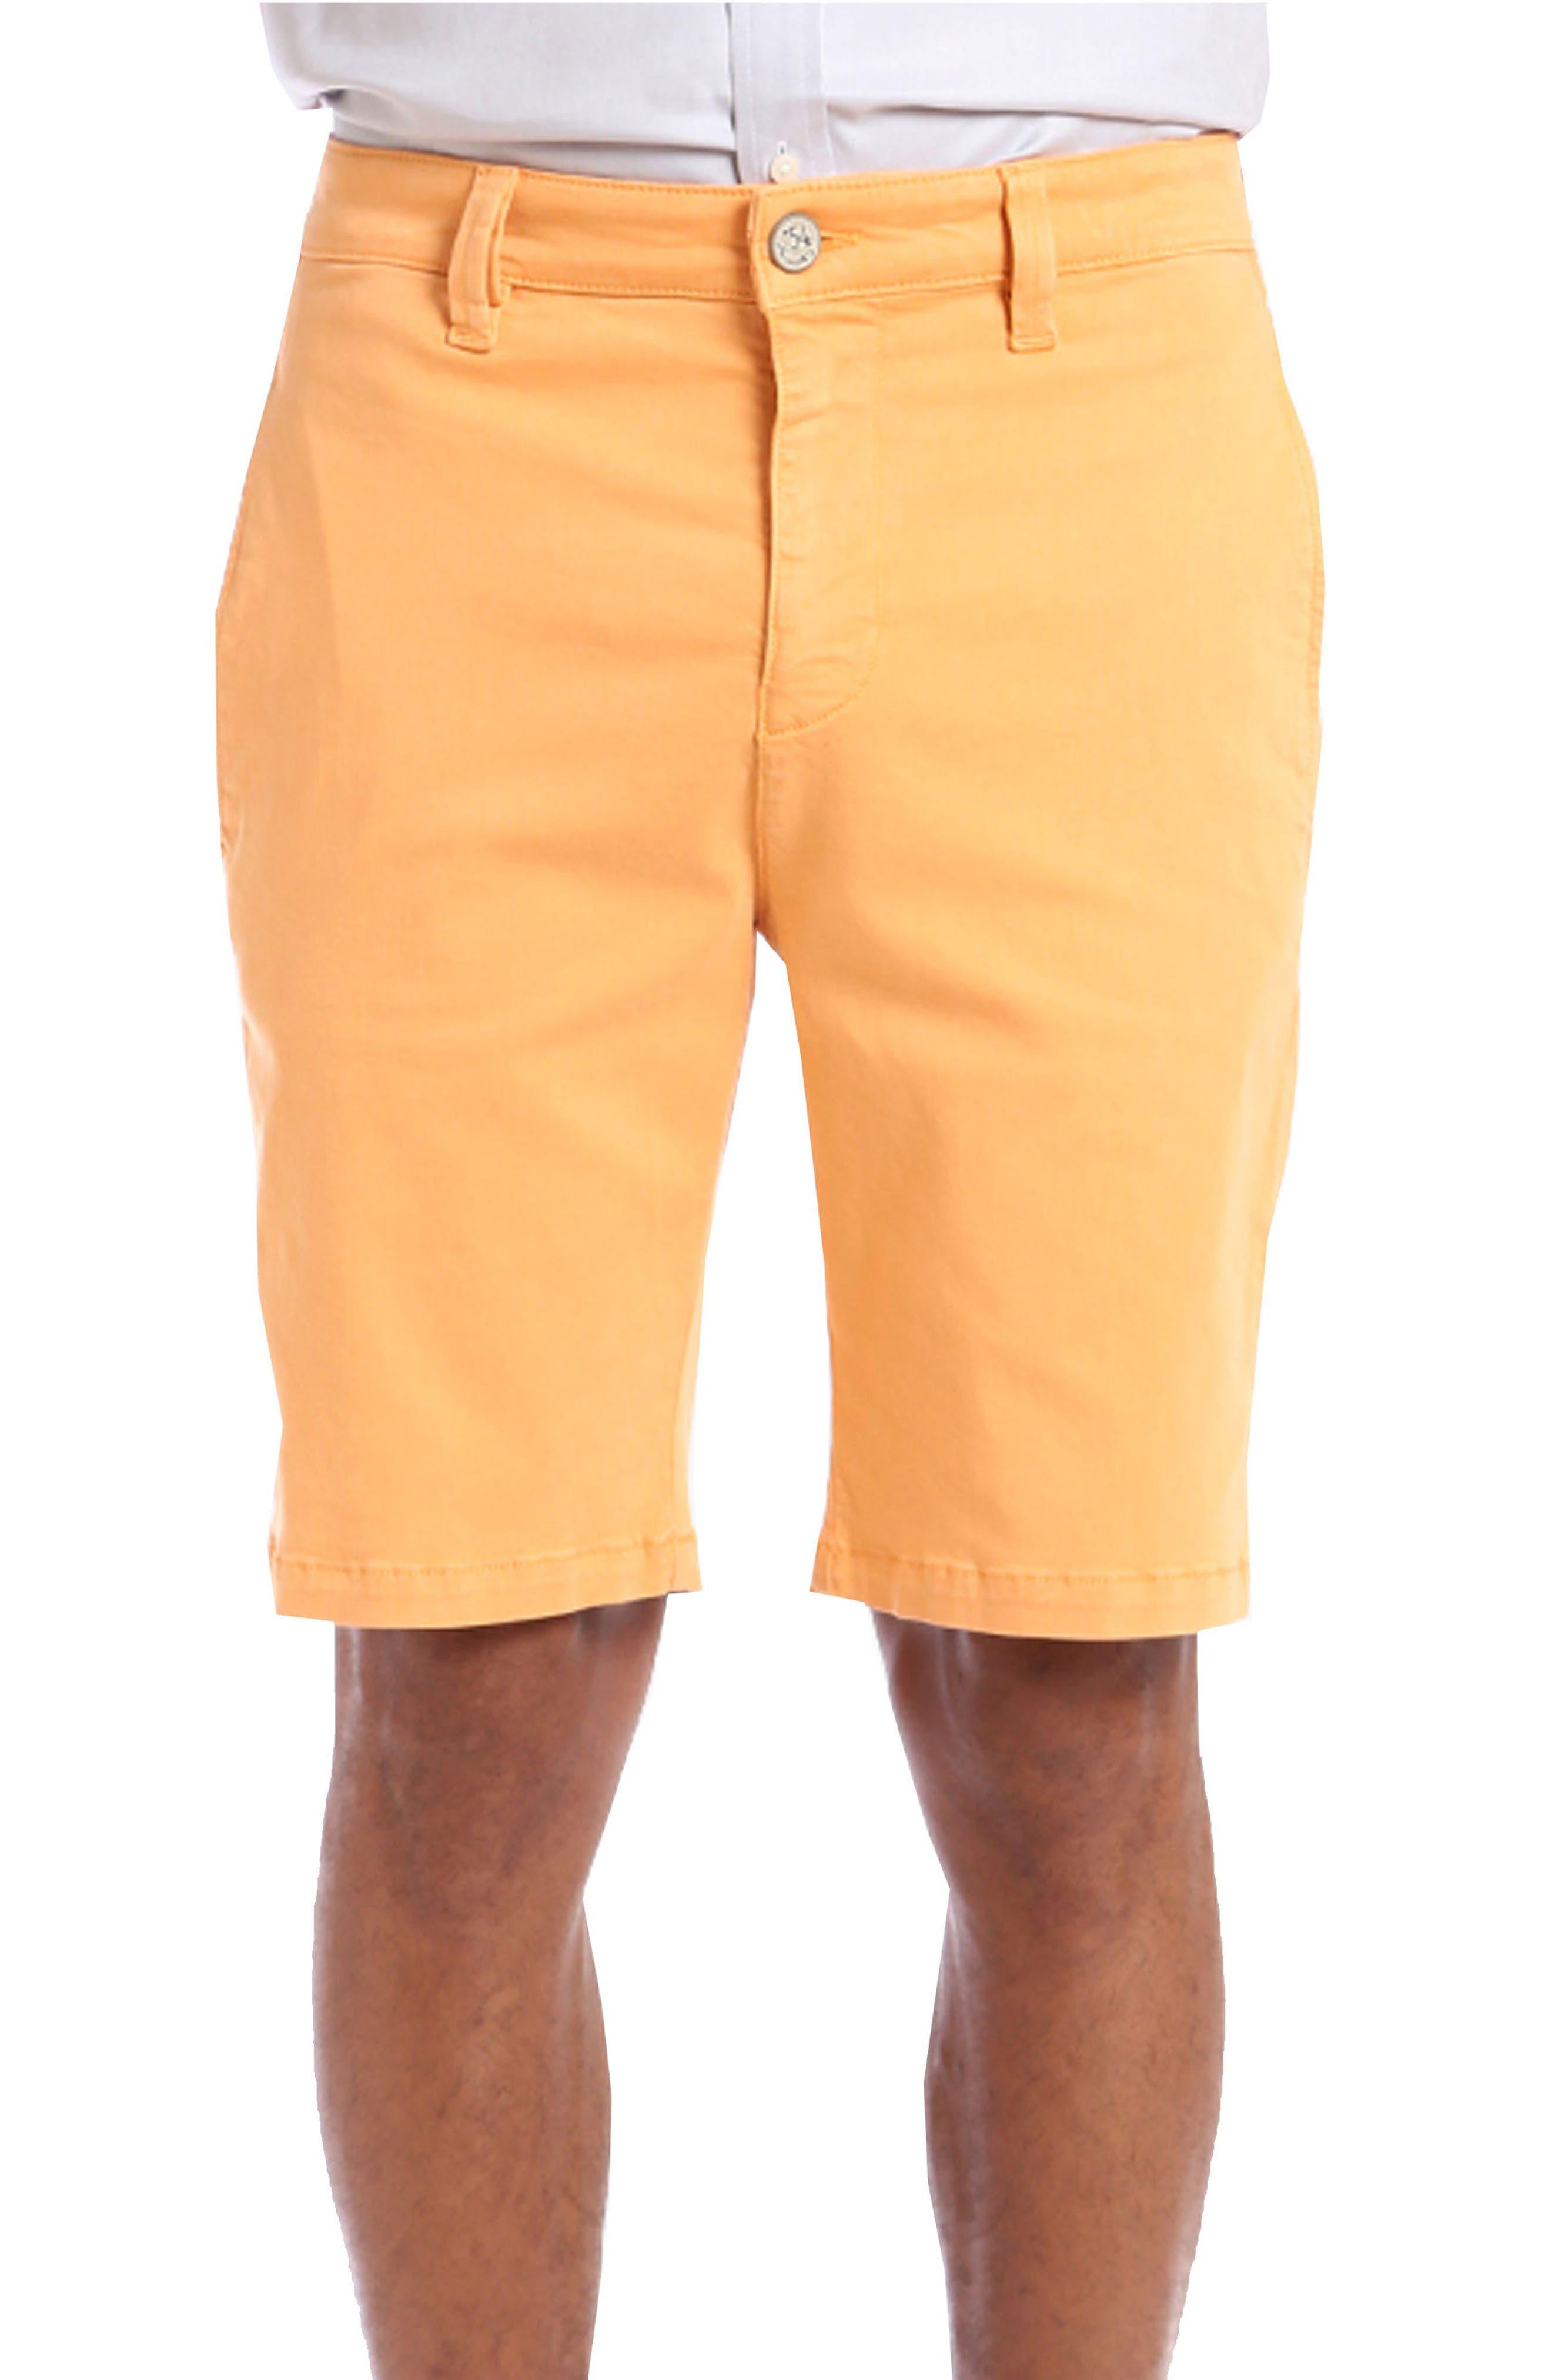 Nevada Twill Shorts, Main, color, PEACH TWILL